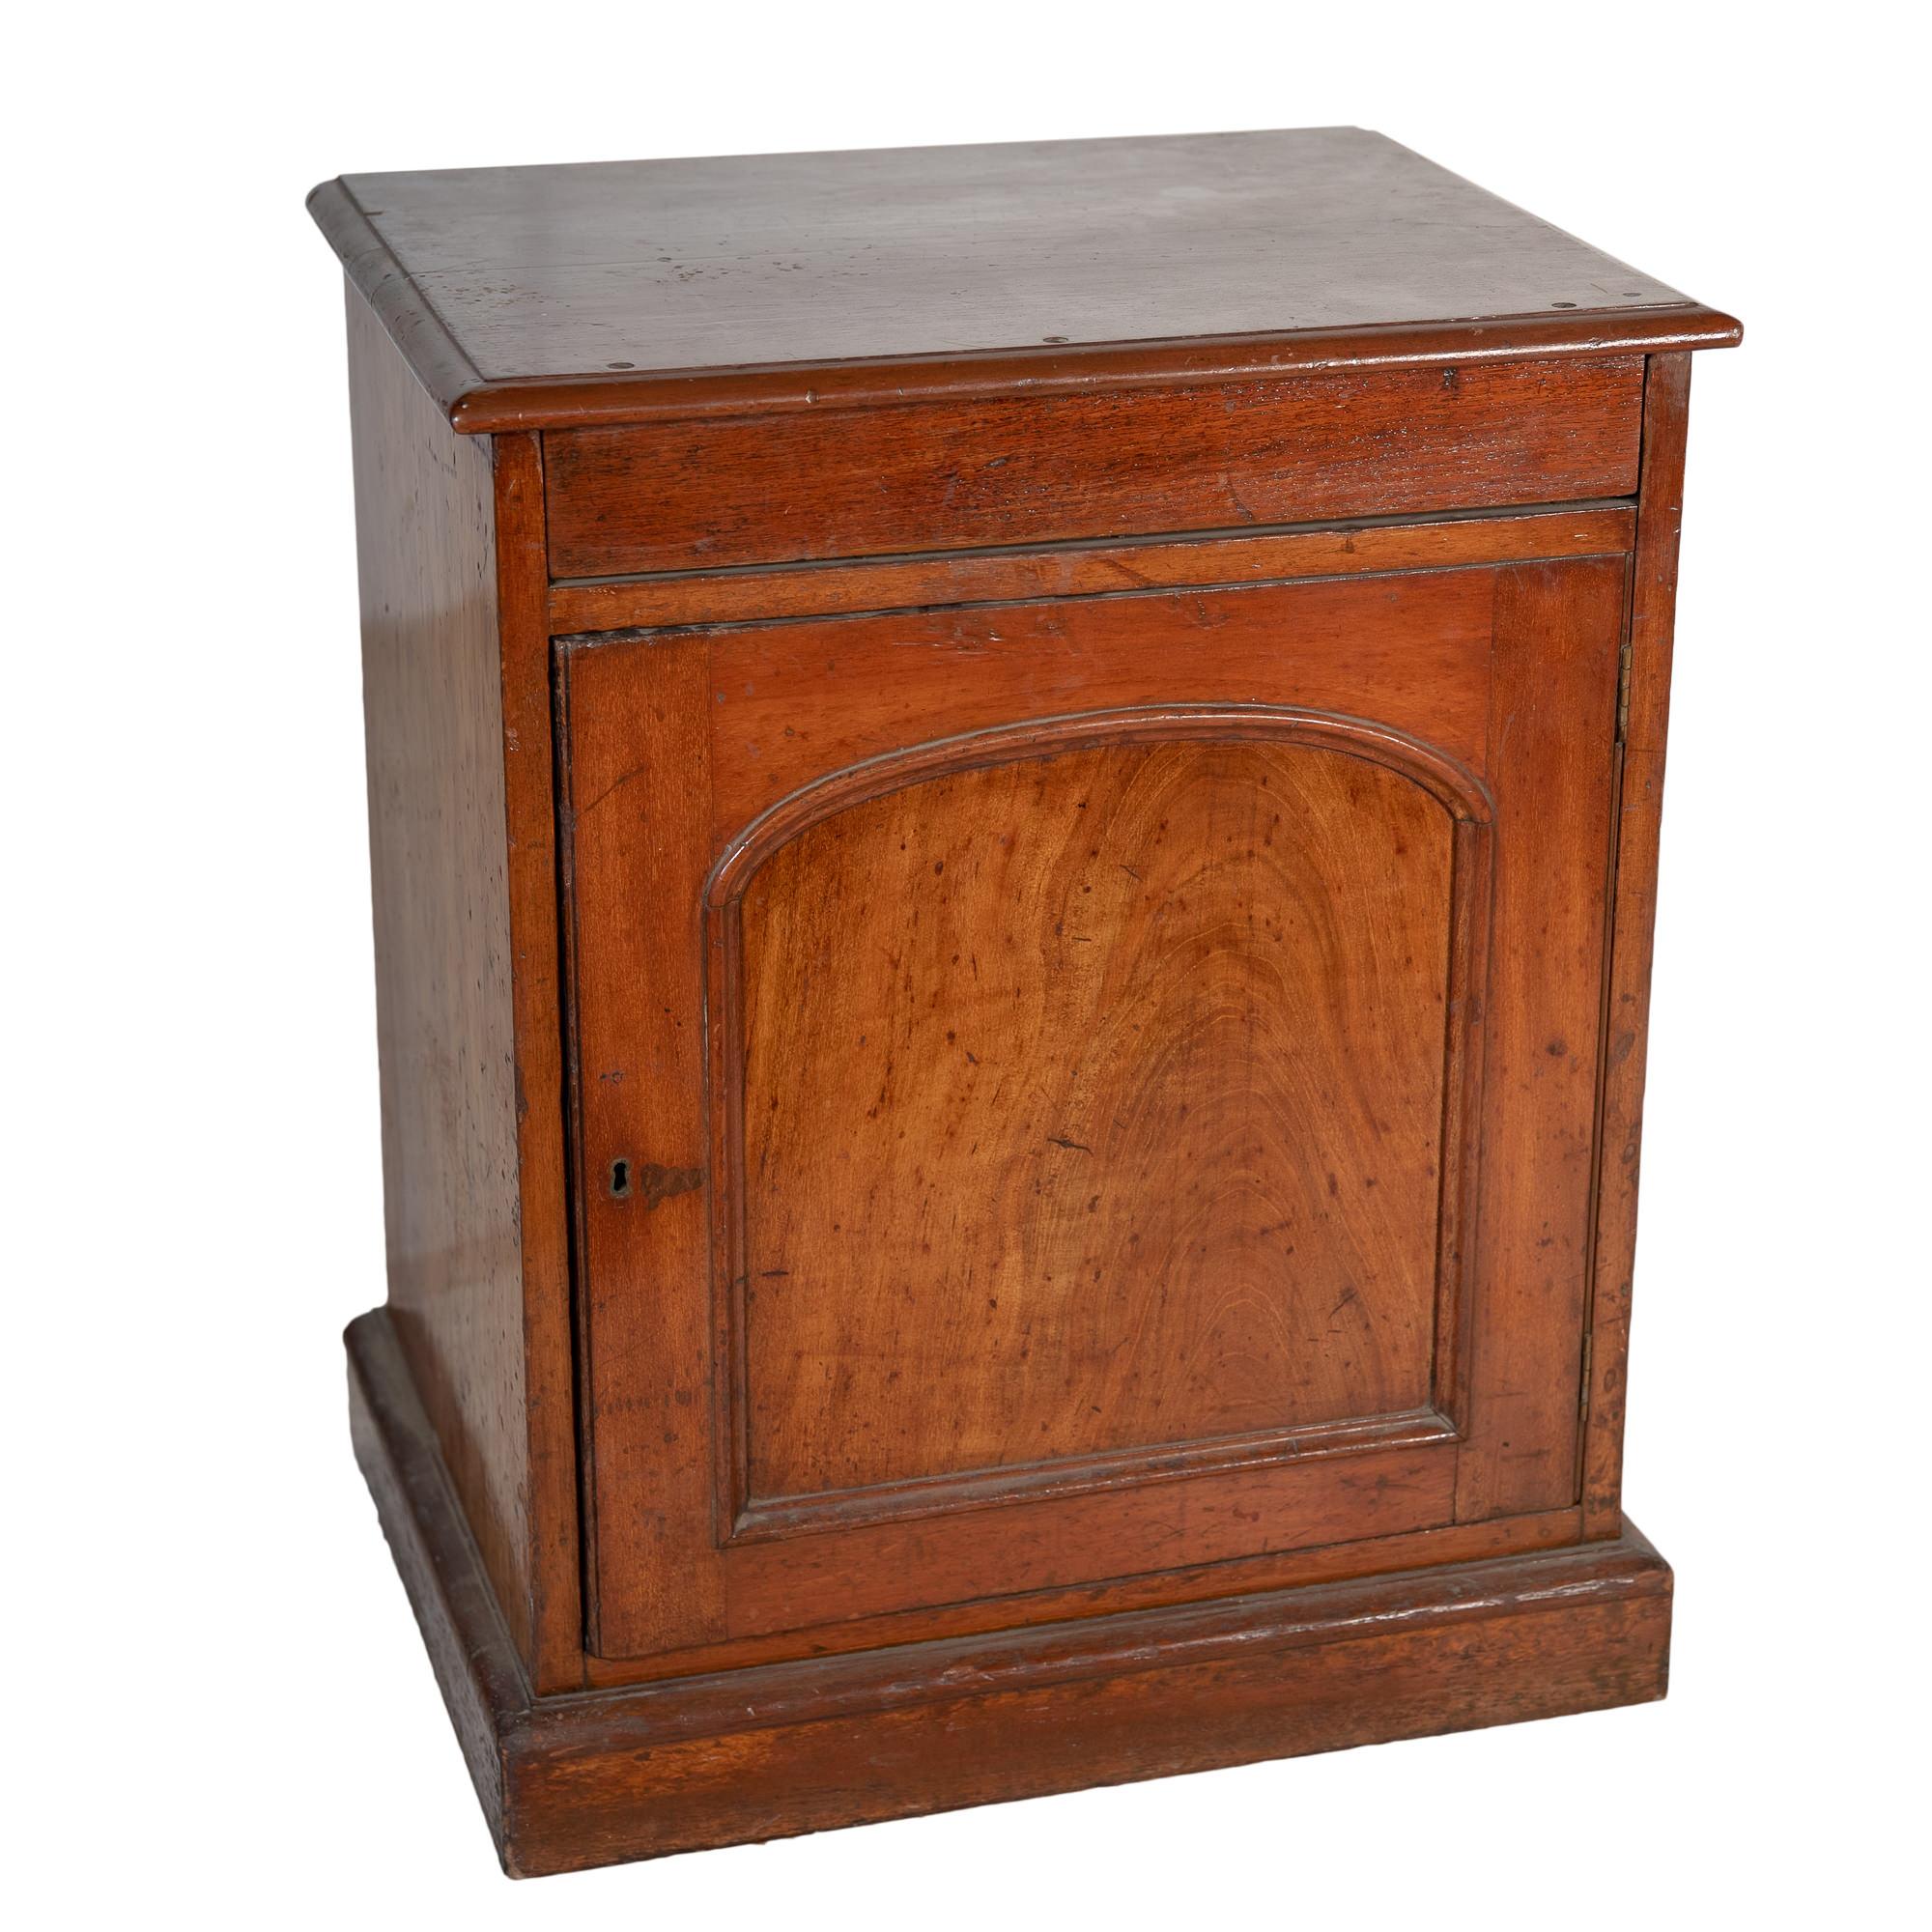 'Rare Australian Cedar Washstand Late 19th Century'